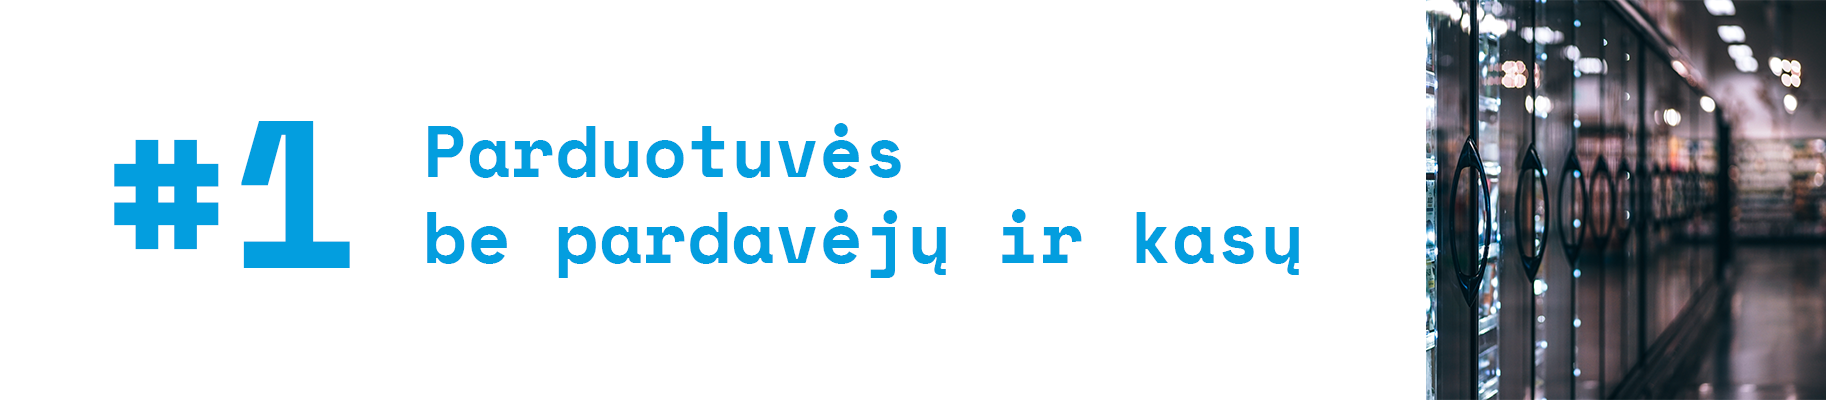 Inovaciju-biuro-antrastes-su-img1